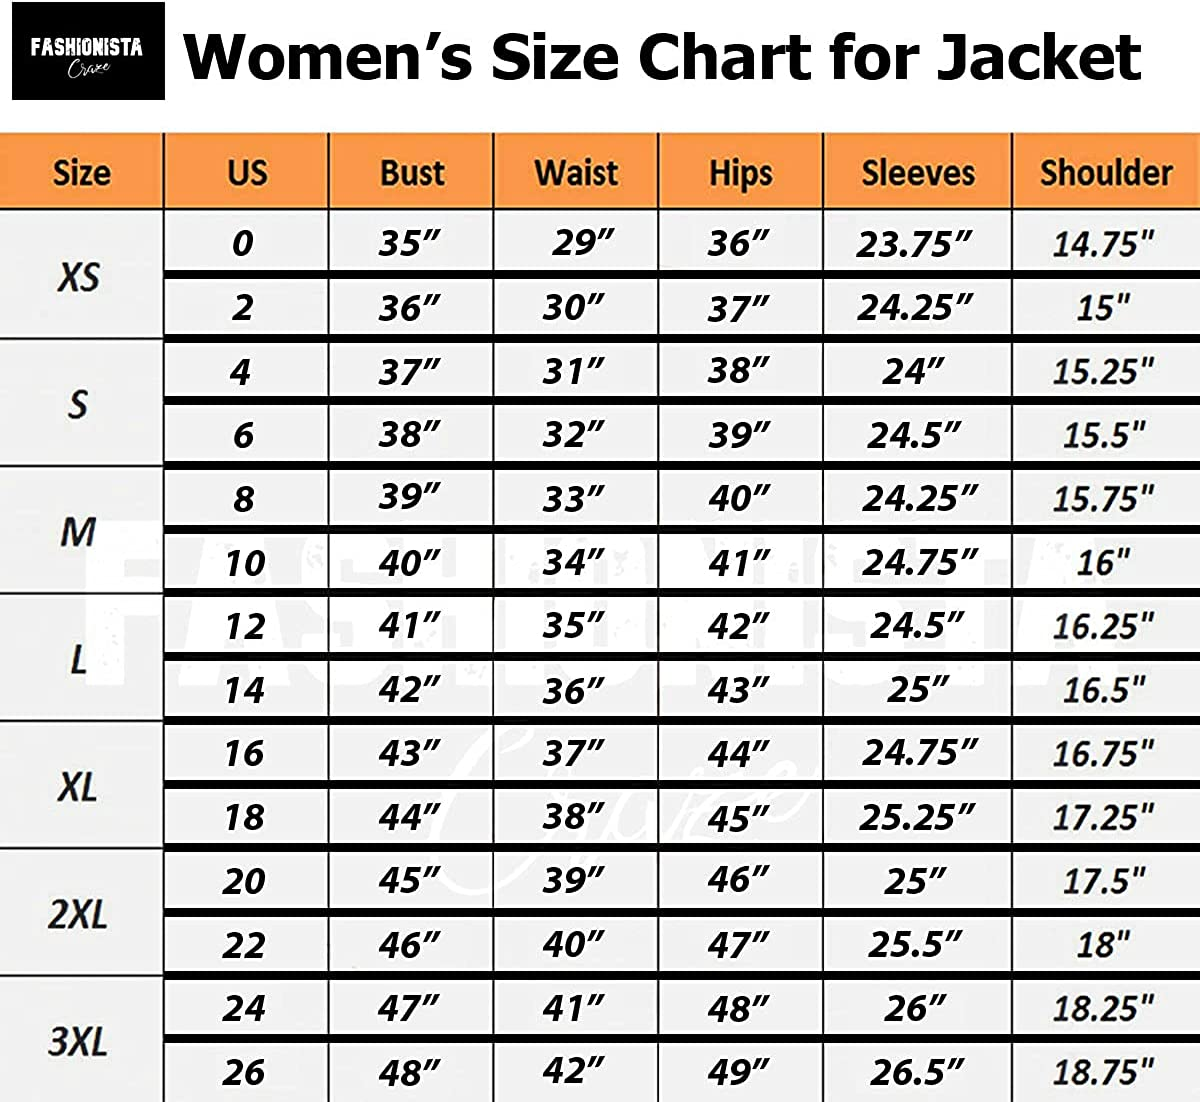 Fashionsta Craze Black Hooded Leather Jacket for Women - Ladies Leather Jacket